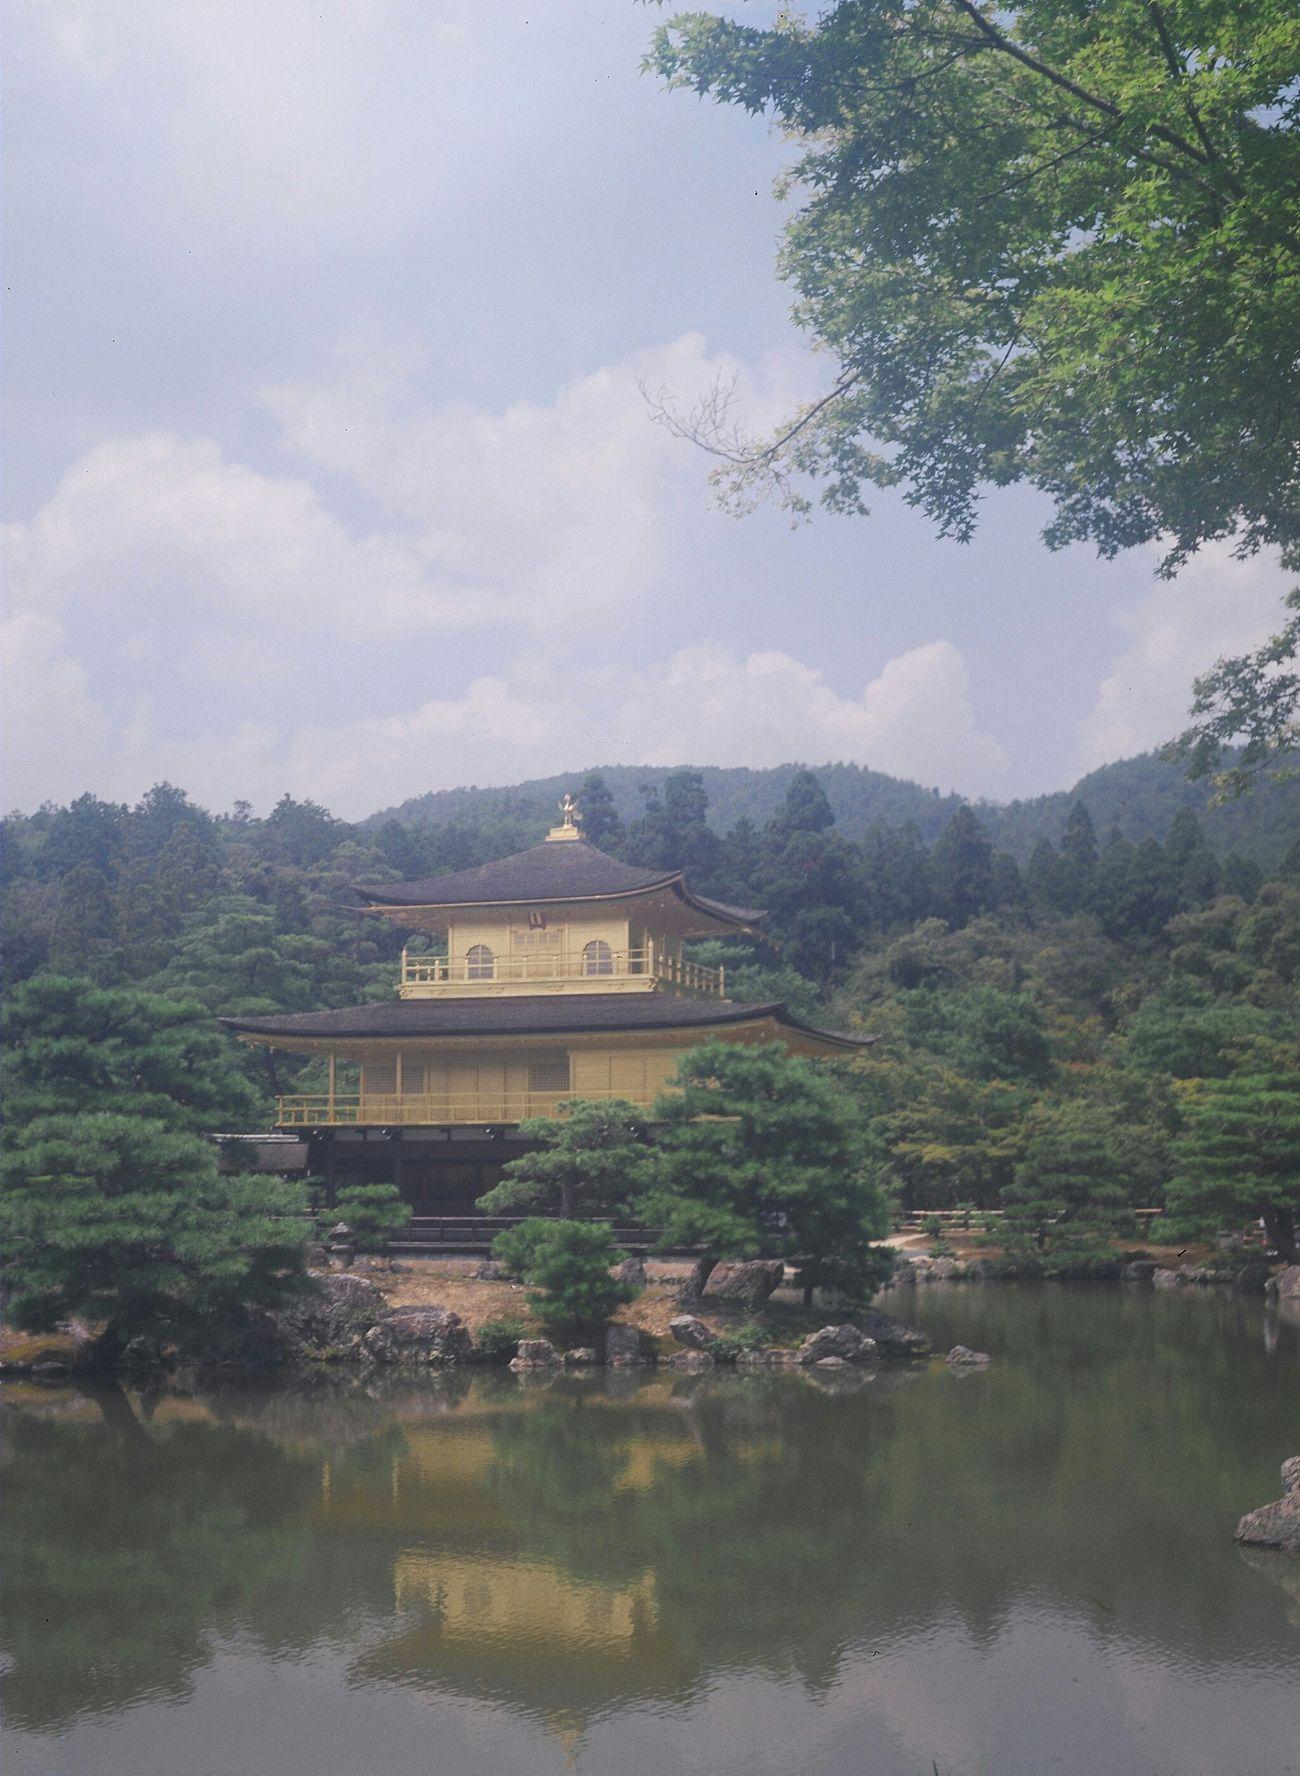 Kyoto Kinkakuji 金閣 前に骨董市で買った セミイコンタという 蛇腹 のカメラで撮ってみたんですけど…やっぱりなんか白っぽい… ブローニーフィルム 120 Film